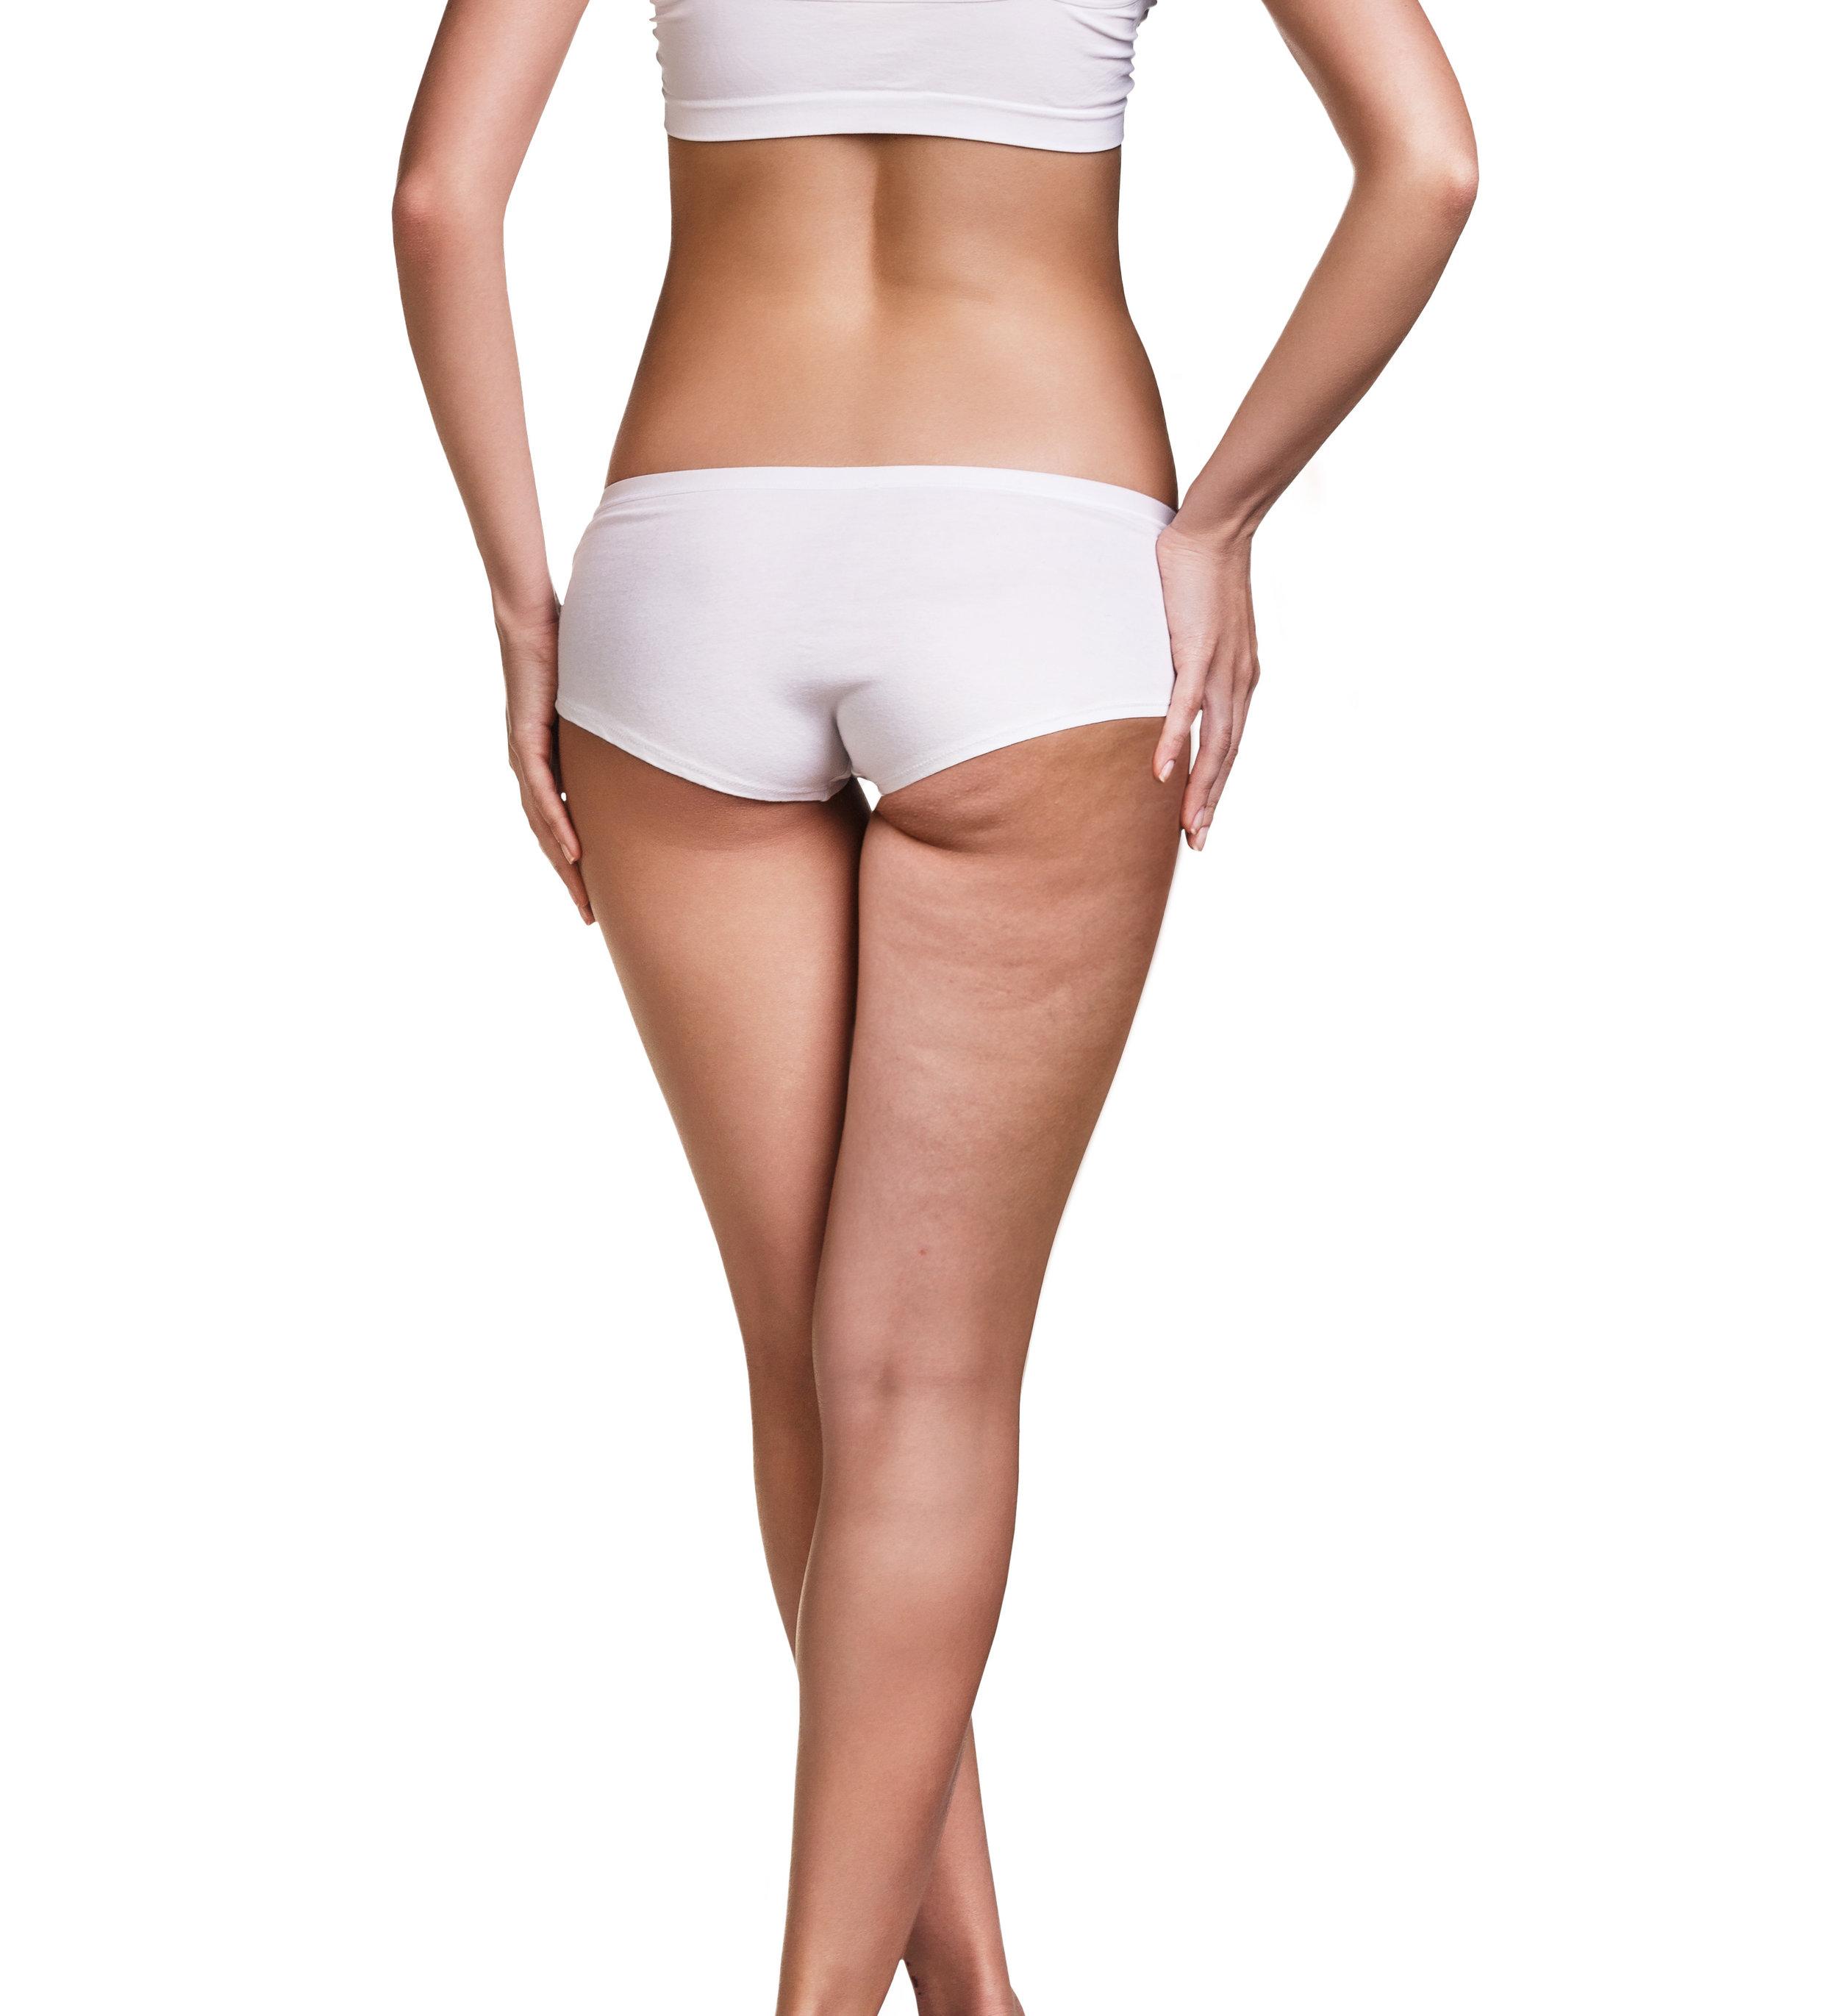 17 Cellulite Behandlung.jpg